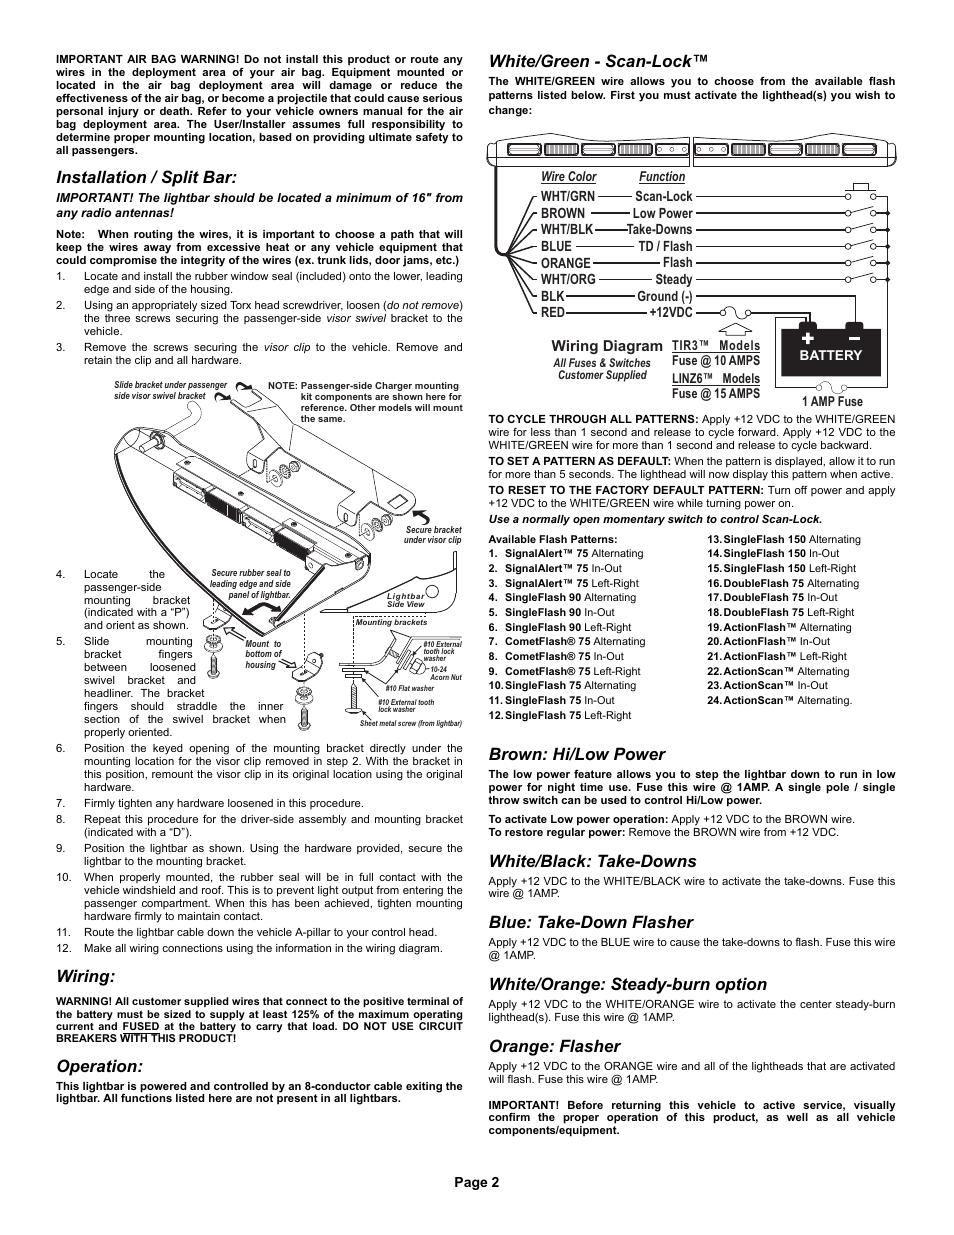 Installation / split bar, Wiring, Operation   Whelen I06UF4P User ...